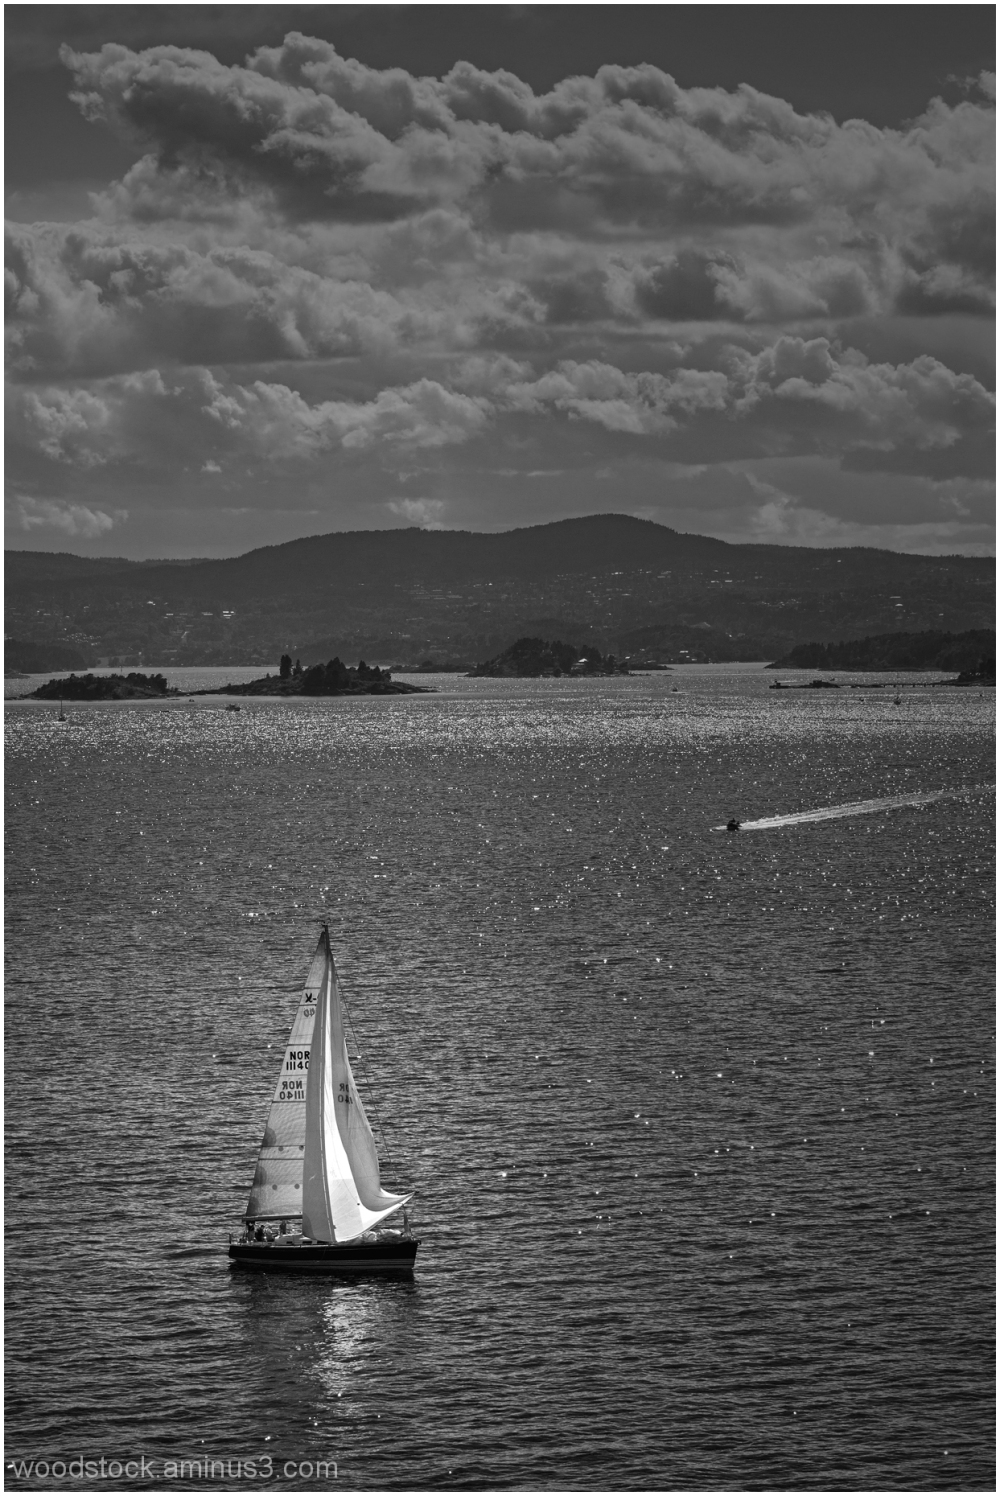 Sailing 1500 images